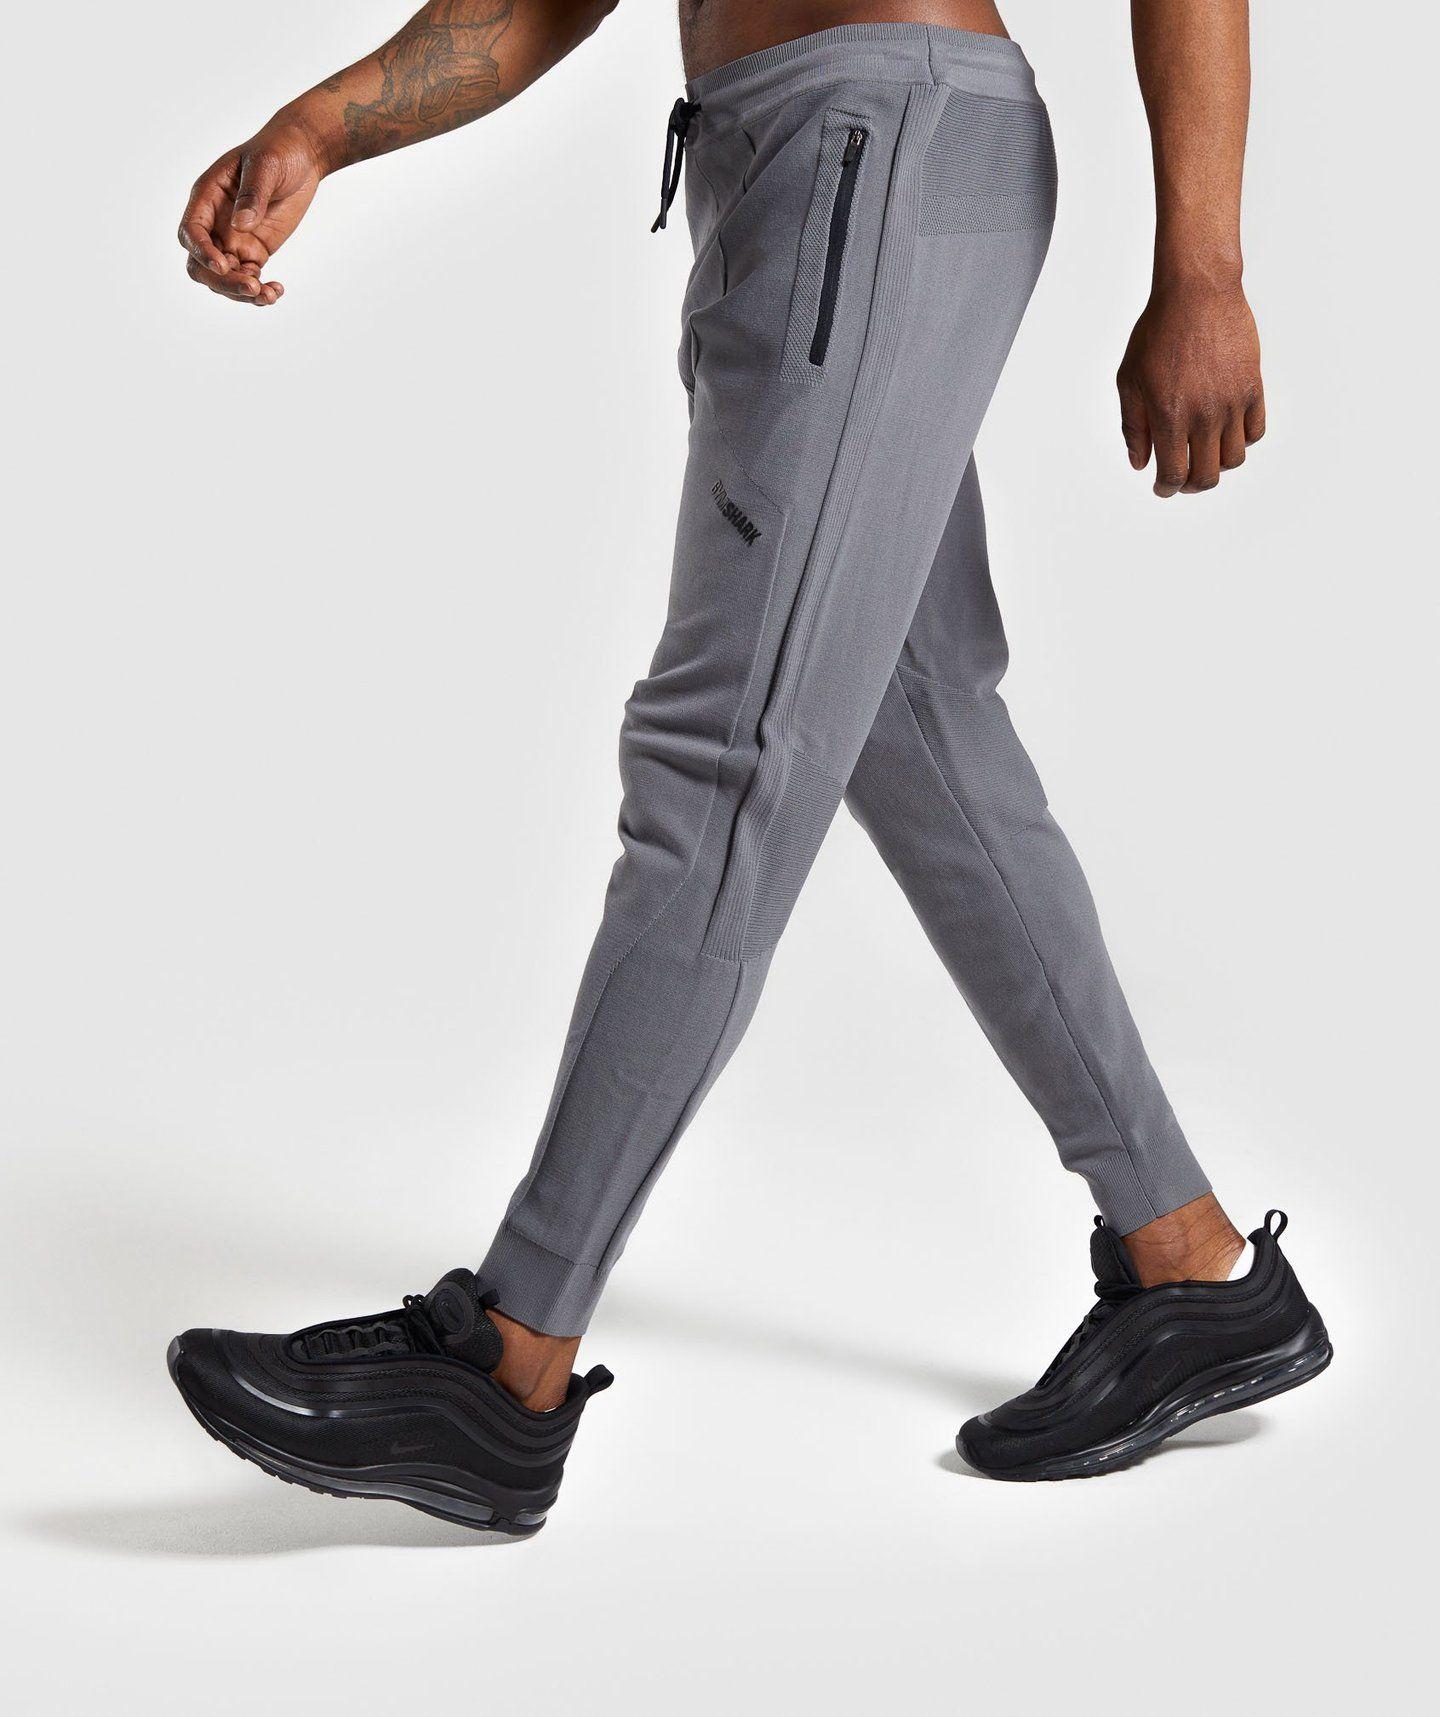 Mens Cotton Knit slim Fit GYM Jogger stretch Ripped tracksuit skinny bottom Grey